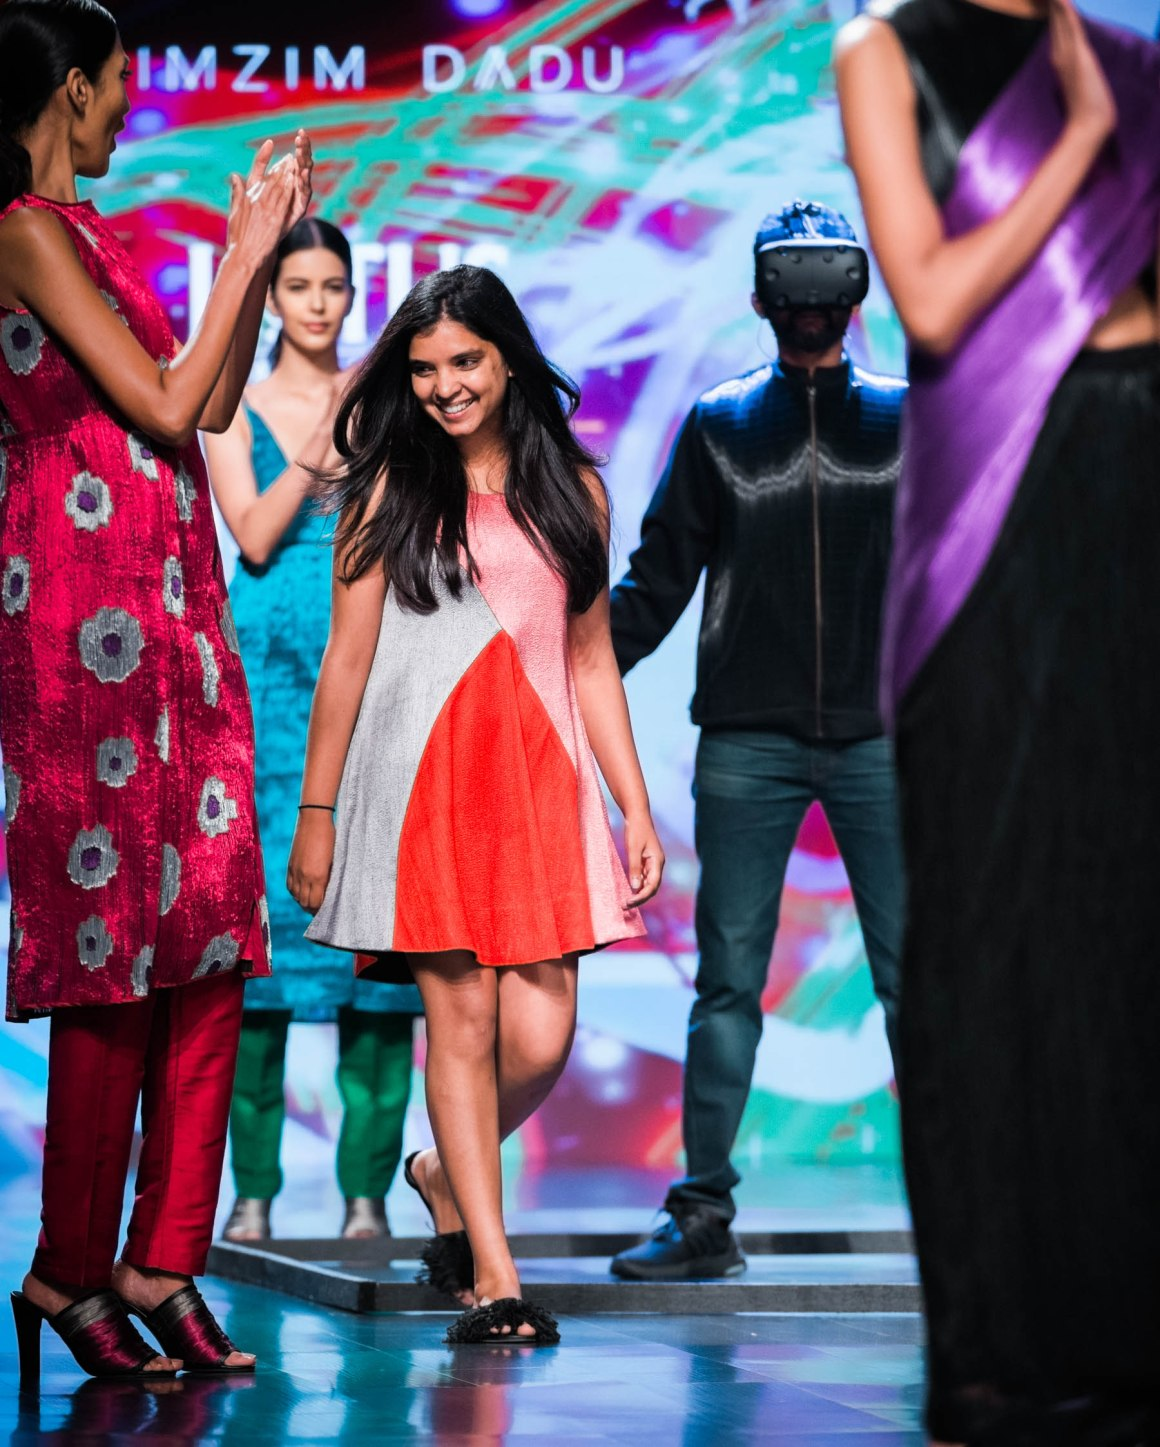 Naina Redhu, Naina.co, Rimzim Dadu, Fashion Designer, FDCI, Lotus MakeUp India Fashion Week Spring Summer 2019, LMIFWSS19, LMIFW, India Fashion Week, Fashion Week Delhi, MadeInIndia, Made In India, EyesForFashion, Professional Photographer, Blogger, Fashion Photographer, Lifestyle Photographer, Luxury Photographer, Delhi Photographer, Gurgaon Photographer, Delhi Blogger, Gurgaon Blogger, Indian Blogger